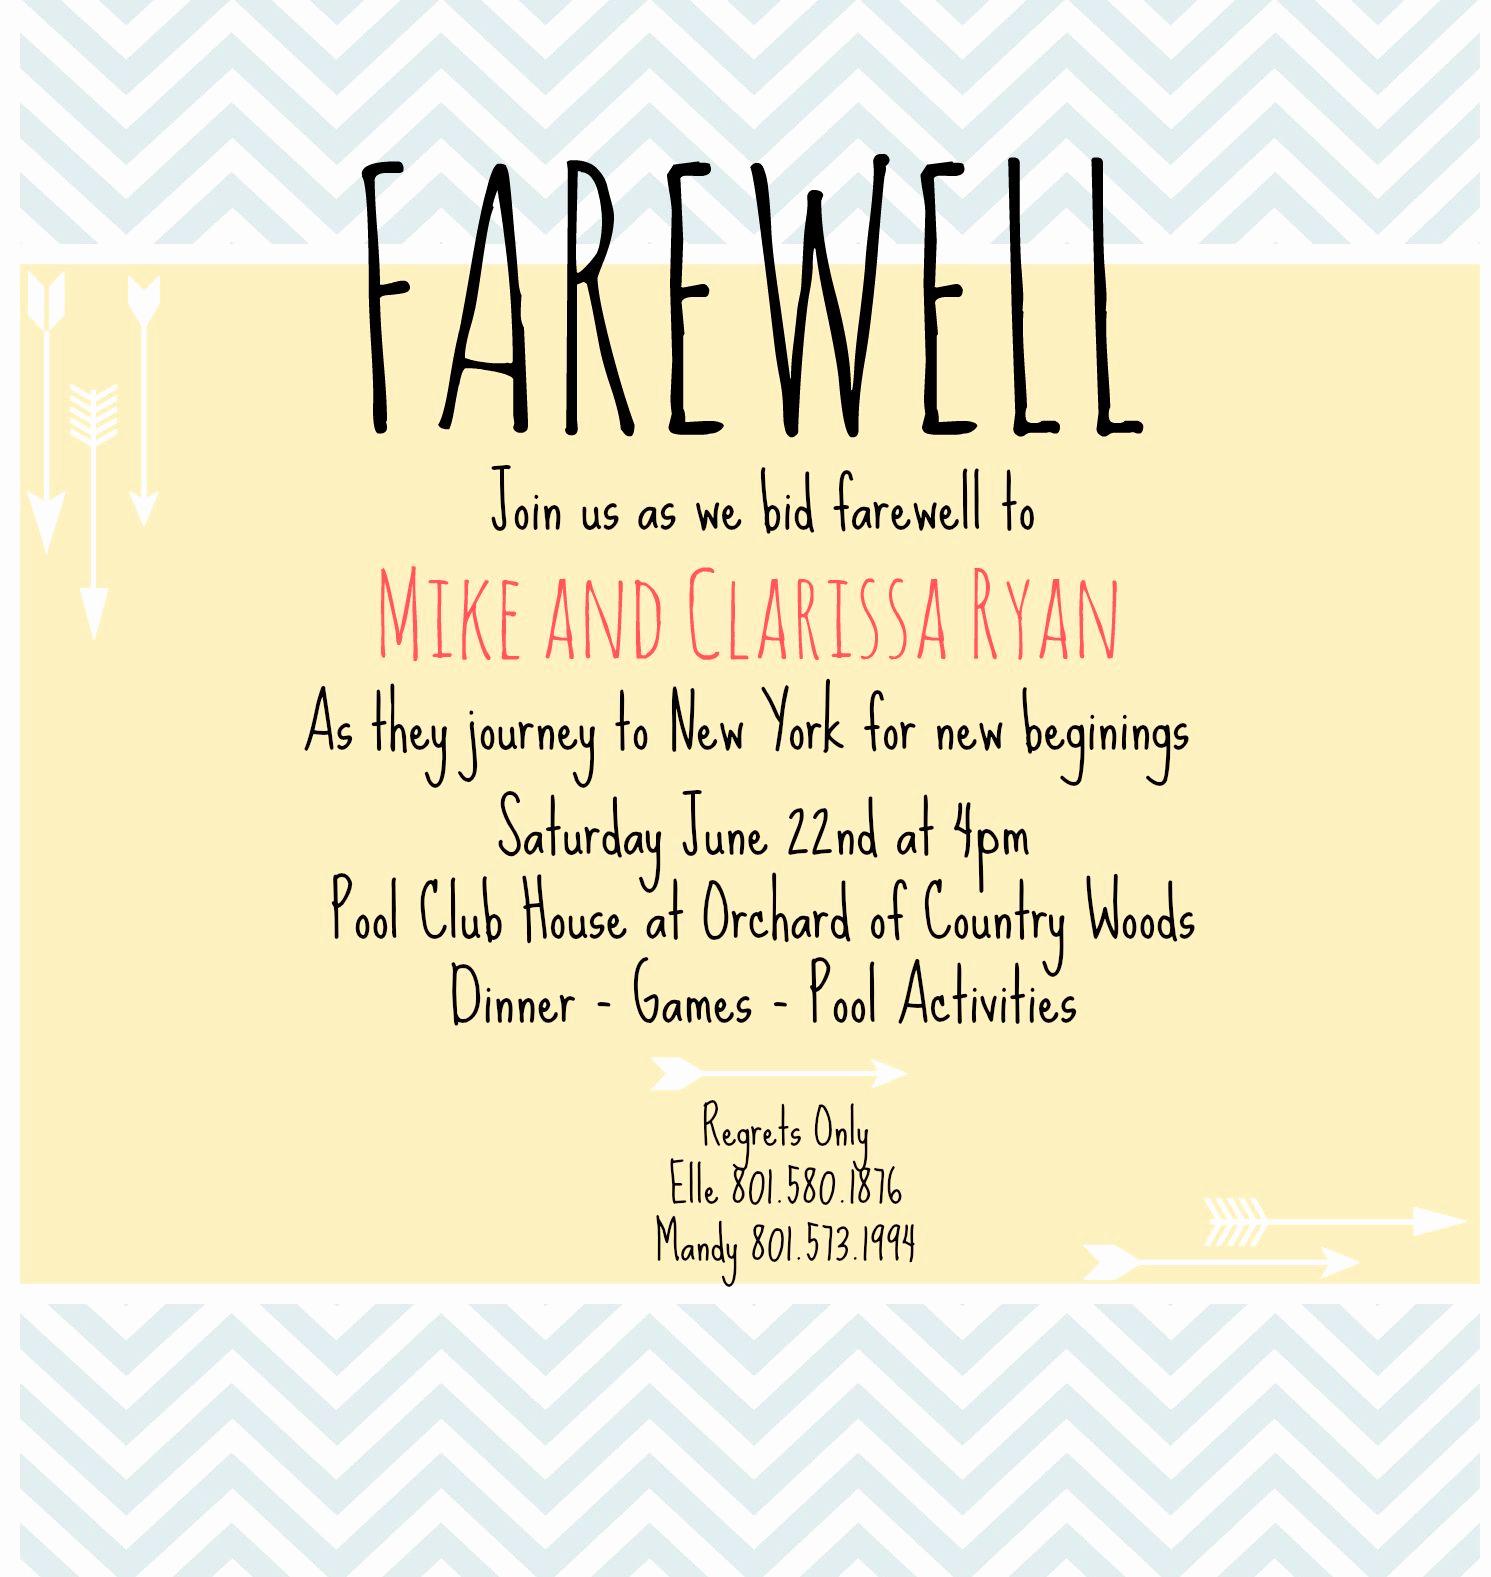 Happy Hour Invitation Wording Fresh Farewell Invite Picmonkey Creations